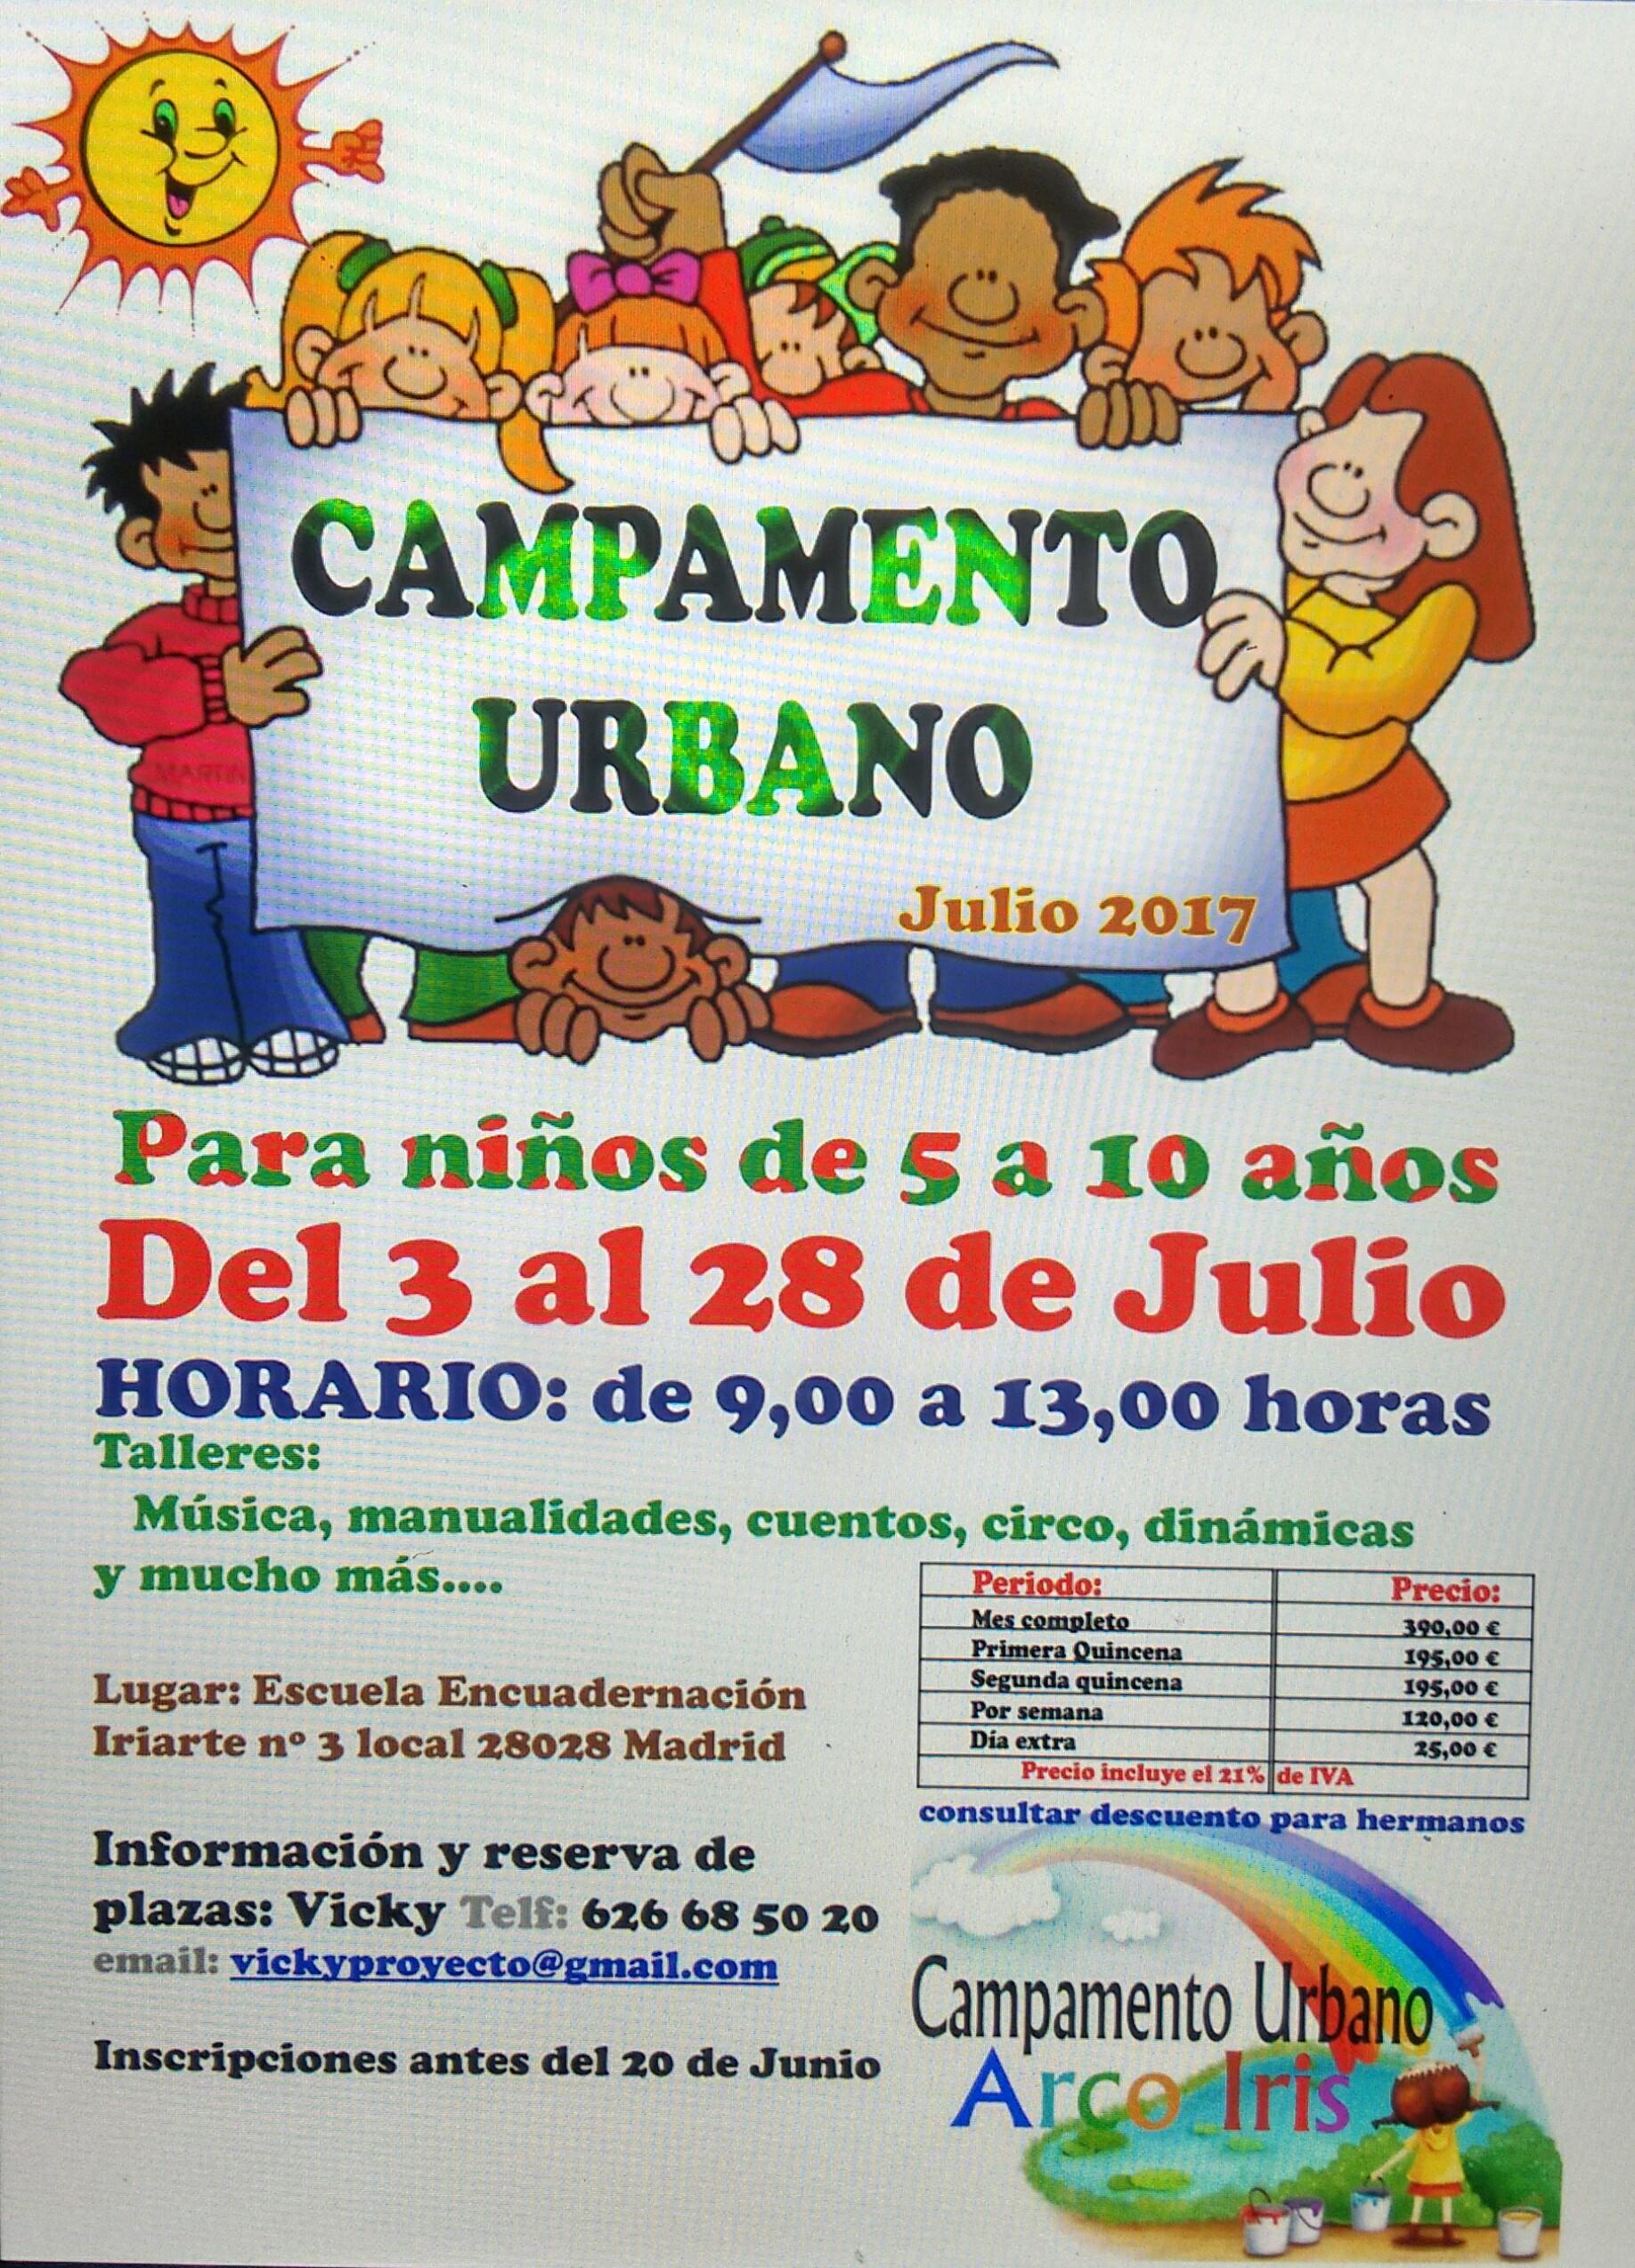 Campamento urbano Arco Iris - Madrid